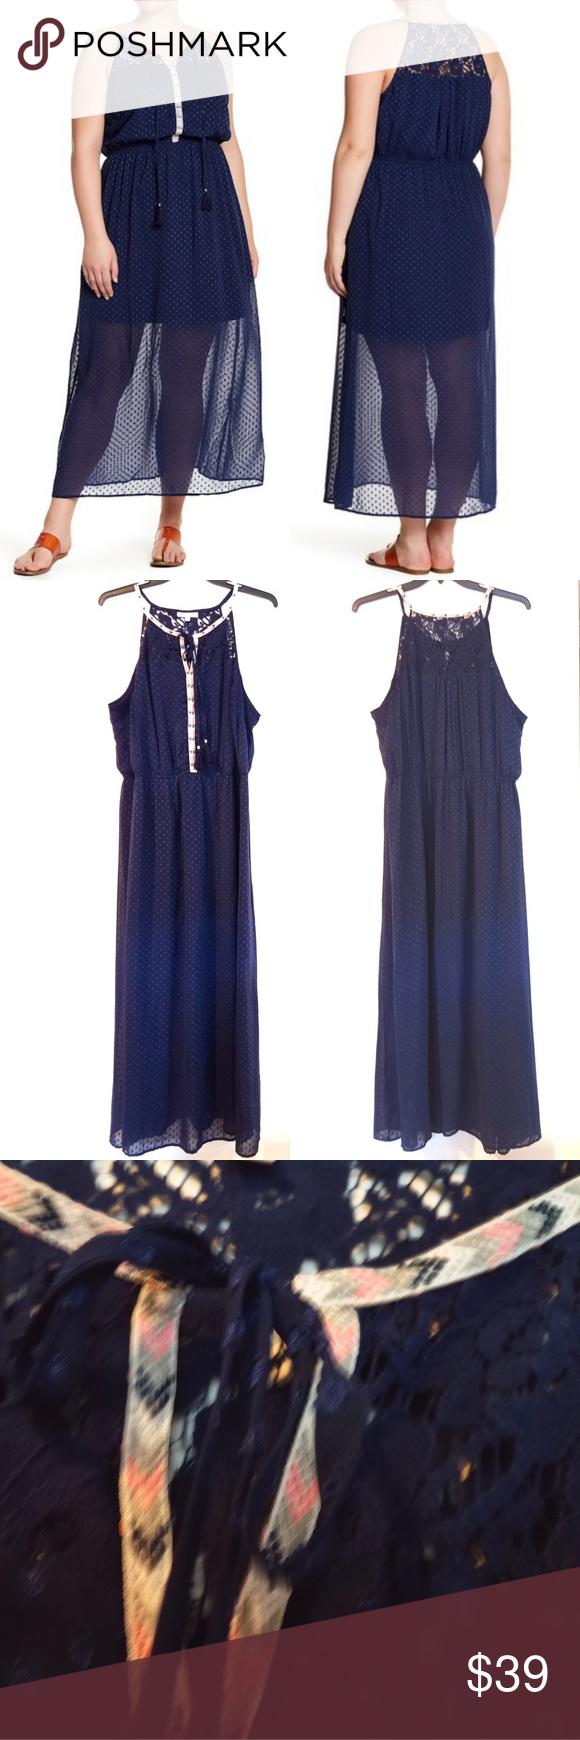 2x Dr2 By Daniel Rainn Navy Blue Maxi Dress Navy Blue Maxi Dress Maxi Dress Dresses [ 1740 x 580 Pixel ]